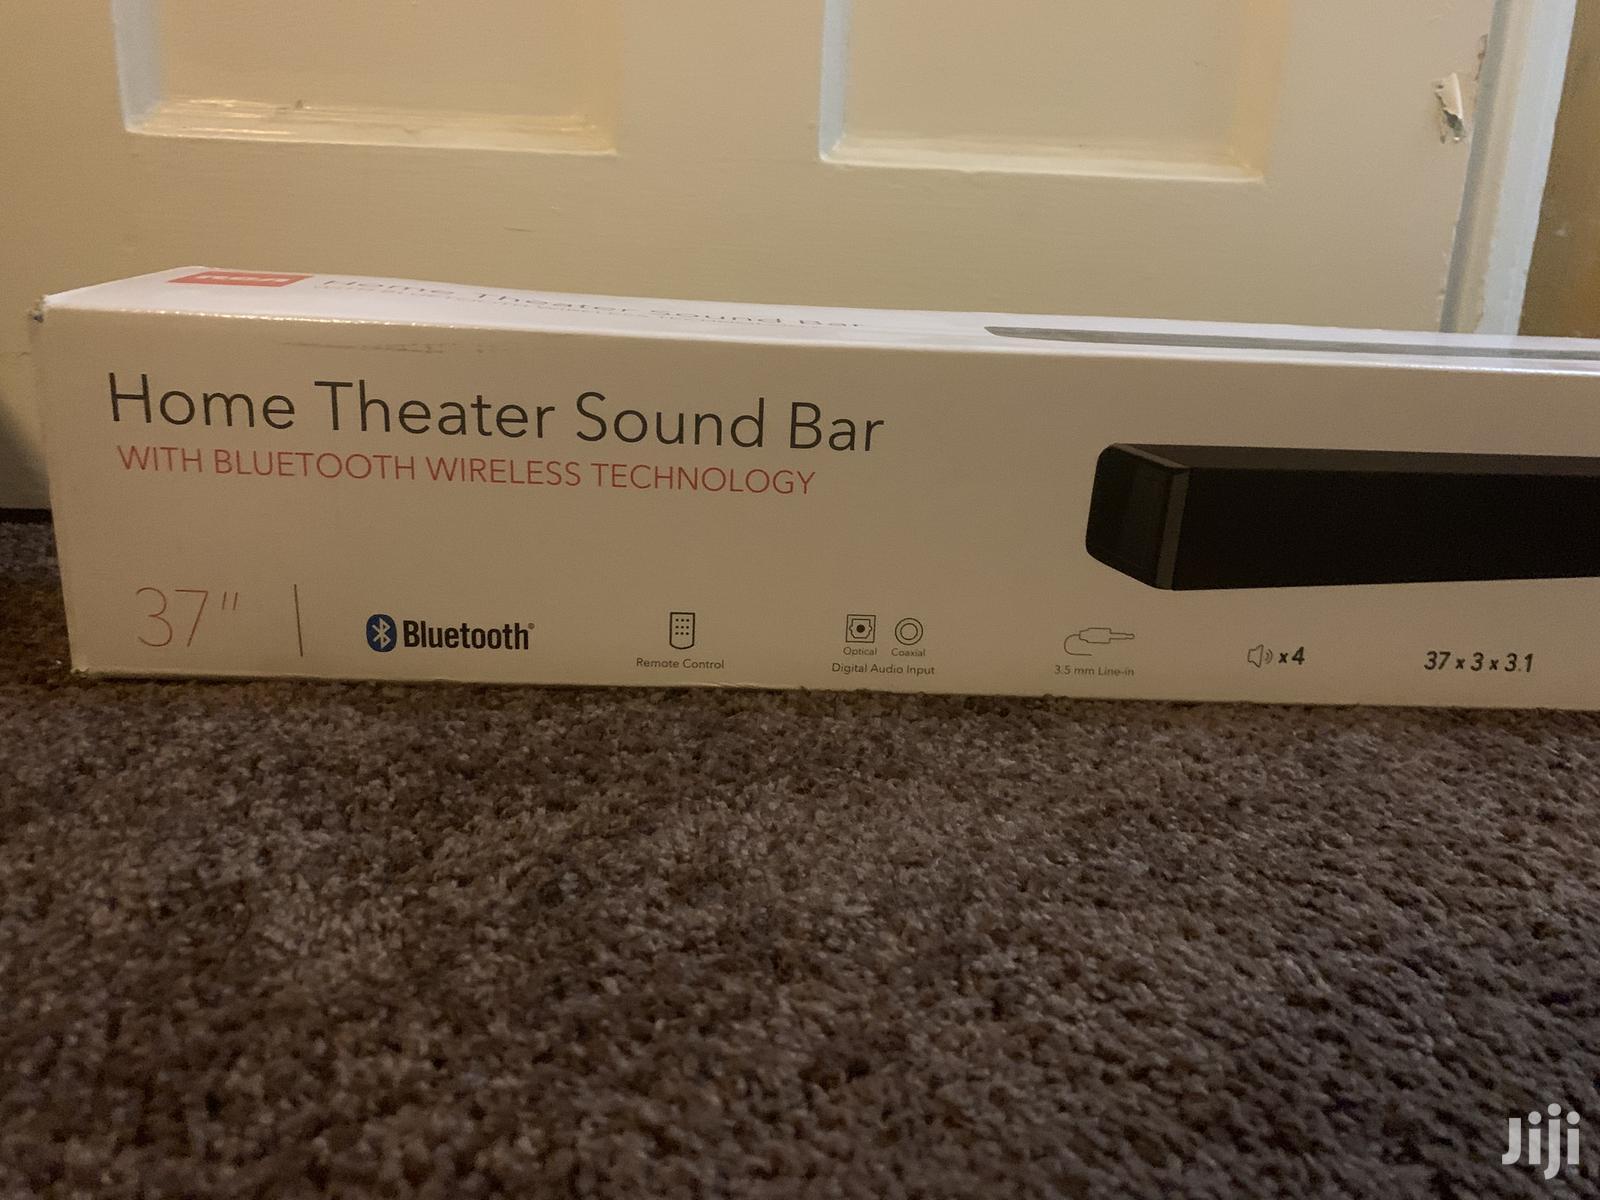 Home Theatre Sound Bar